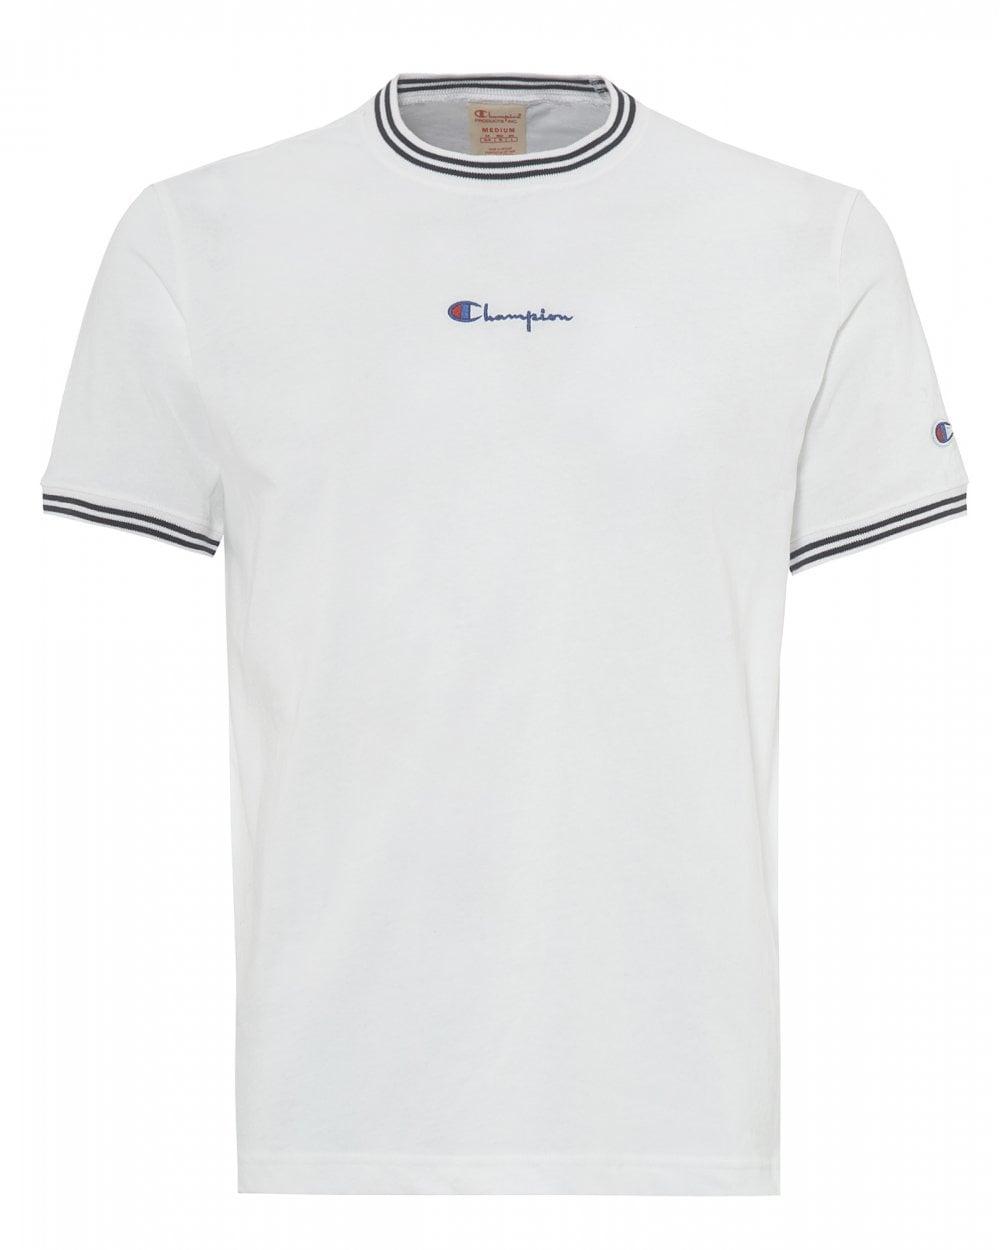 80ff625a6b Champion Mens White Striped Ringer Script Tee, Small Logo T-Shirt